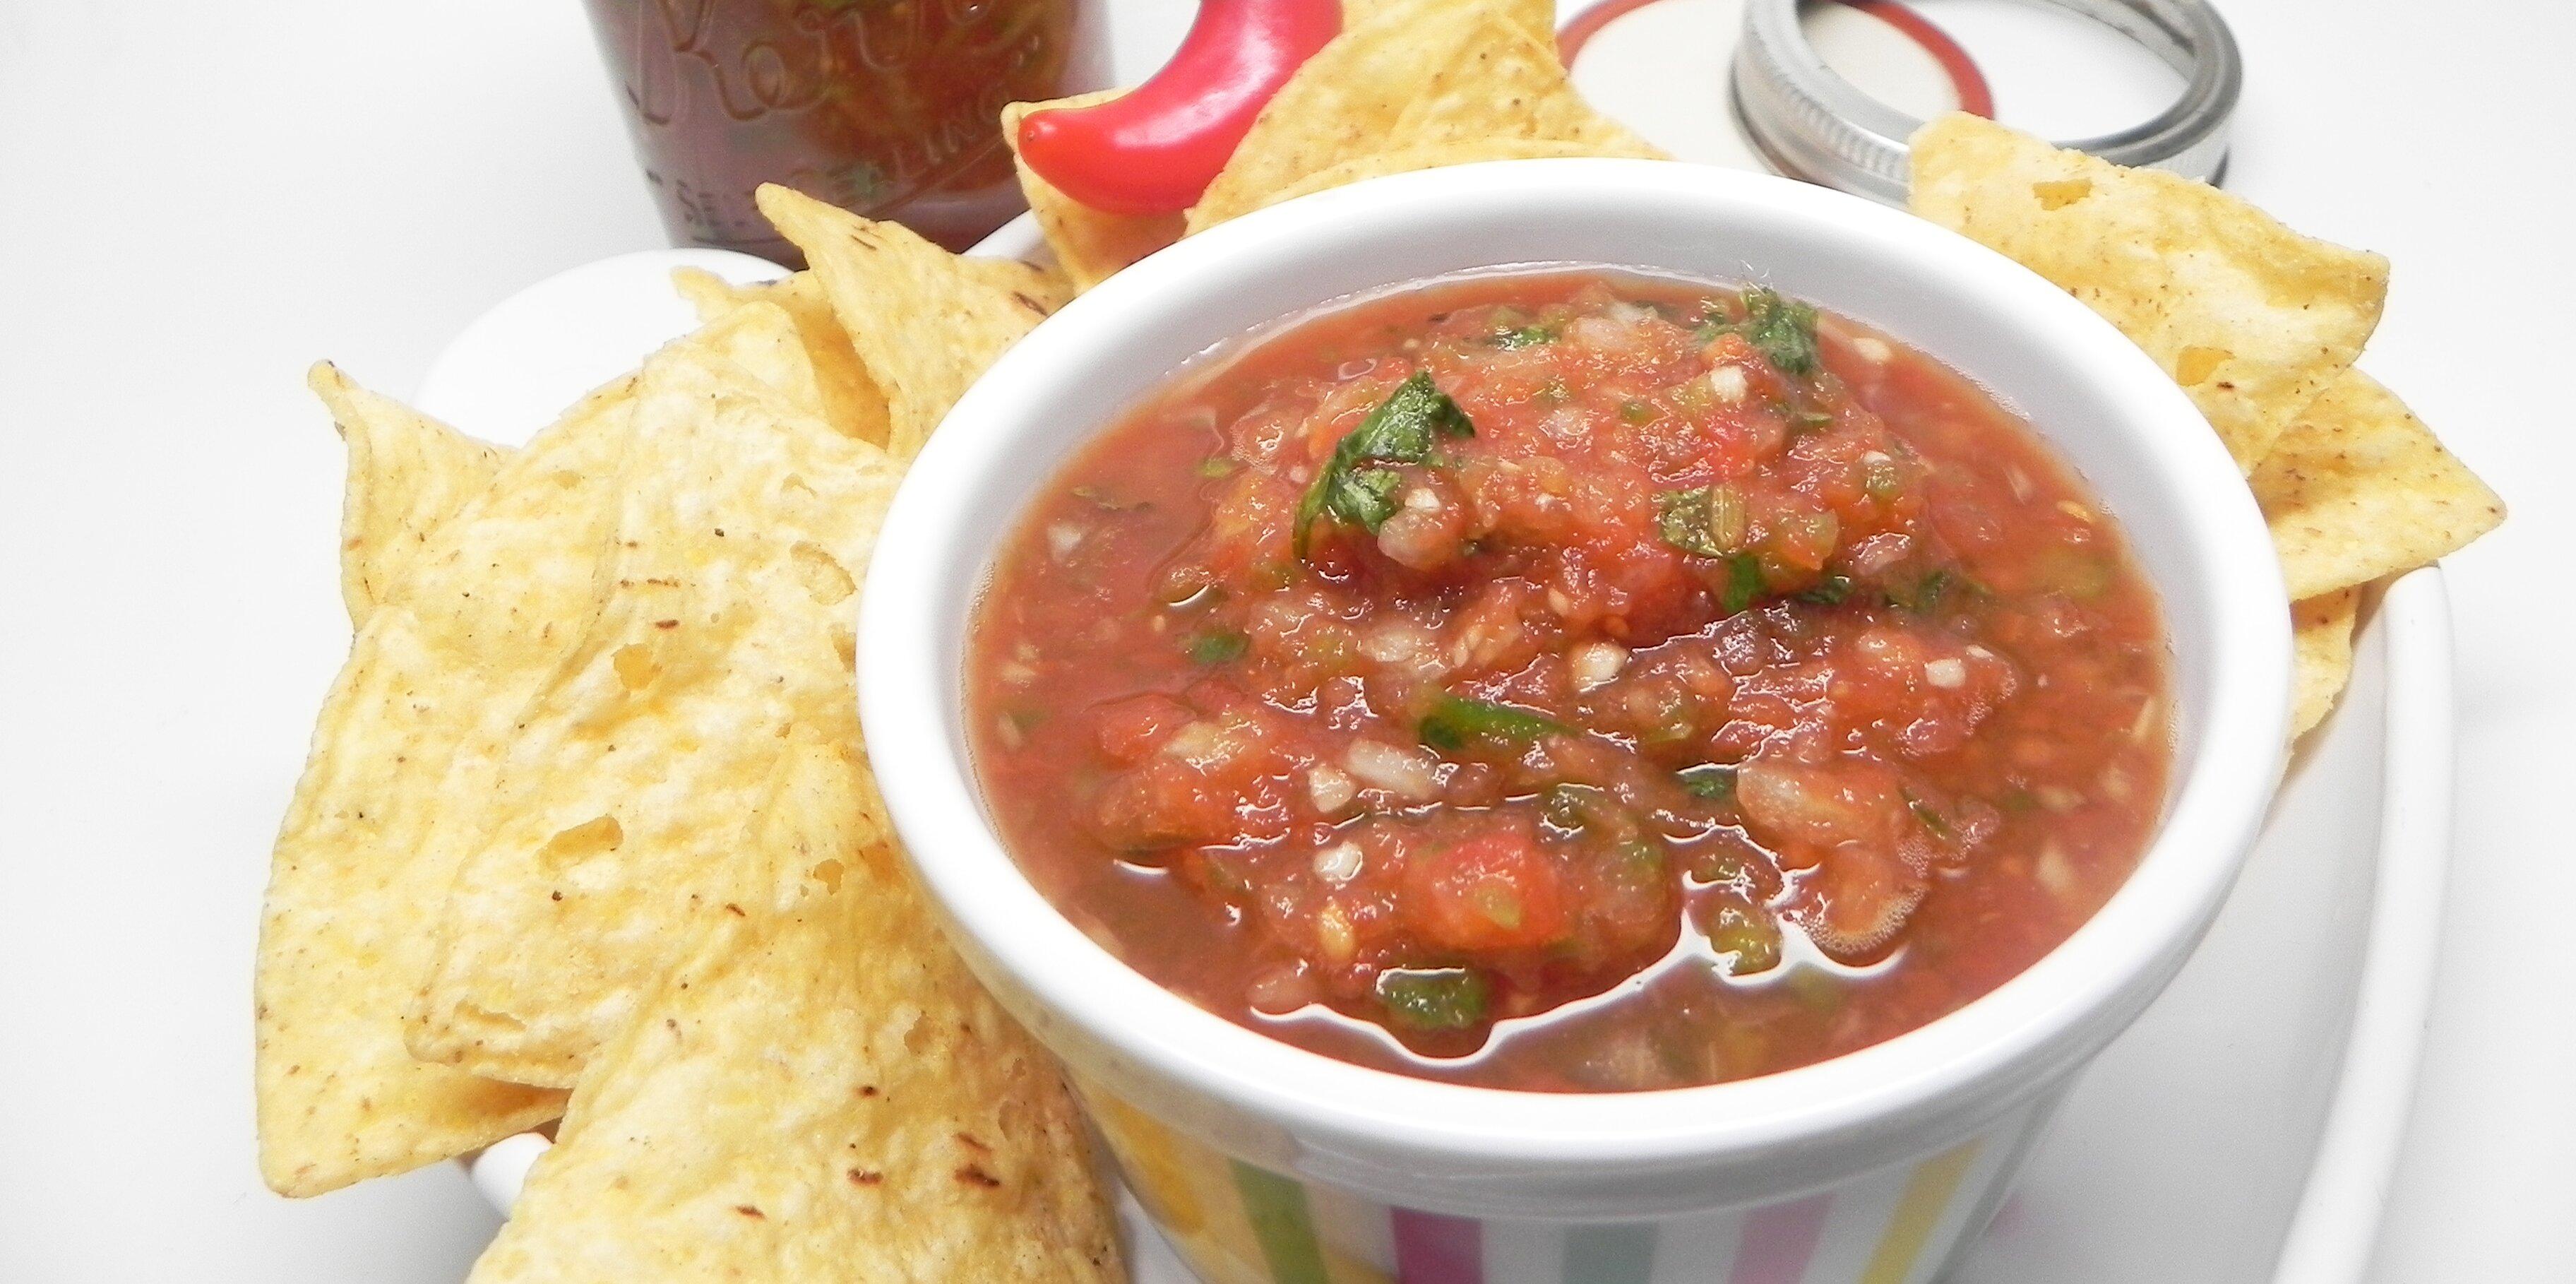 homemade hot sauce with jalapenos recipe